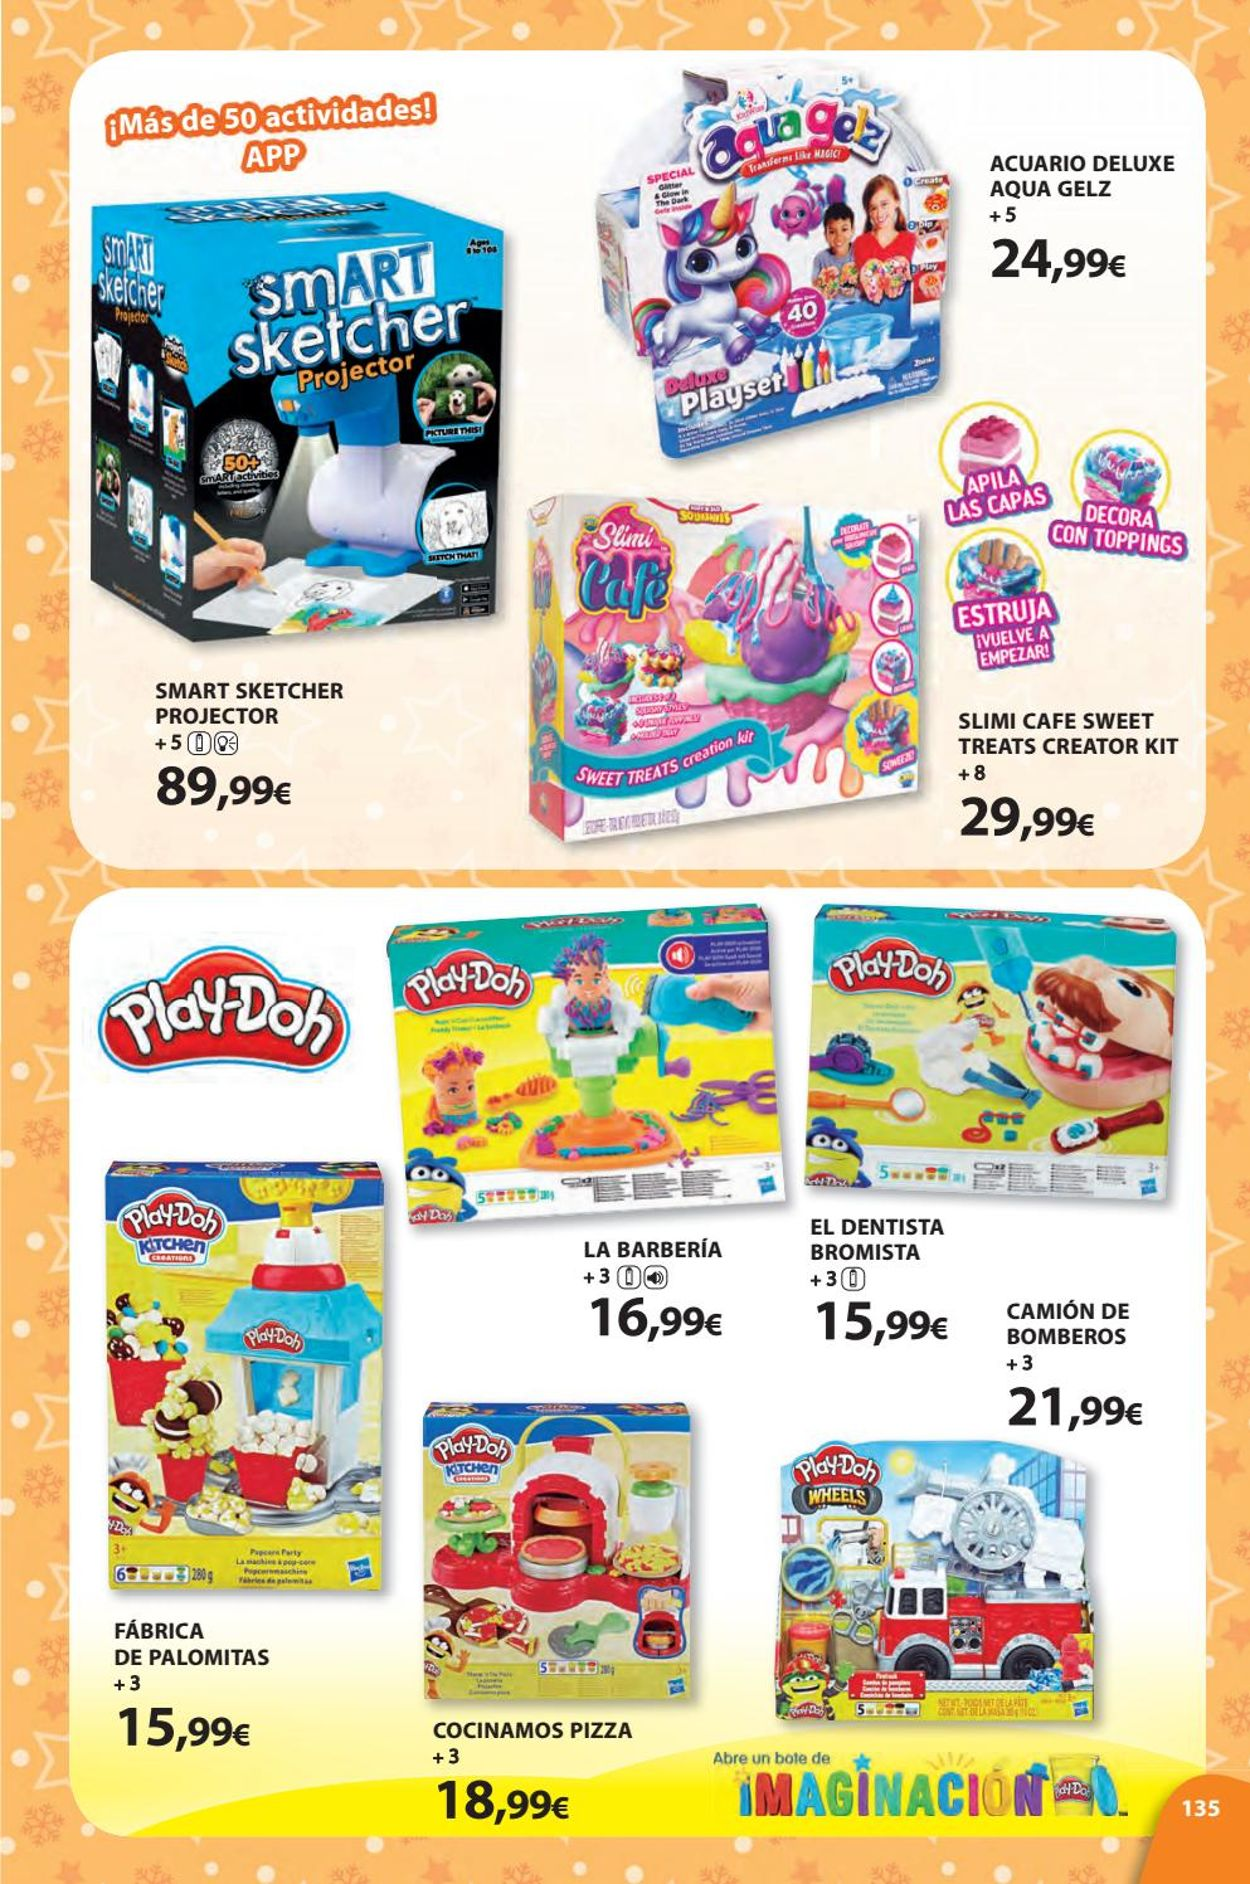 Toy Planet Folleto - 08.11-24.12.2019 (Página 135)